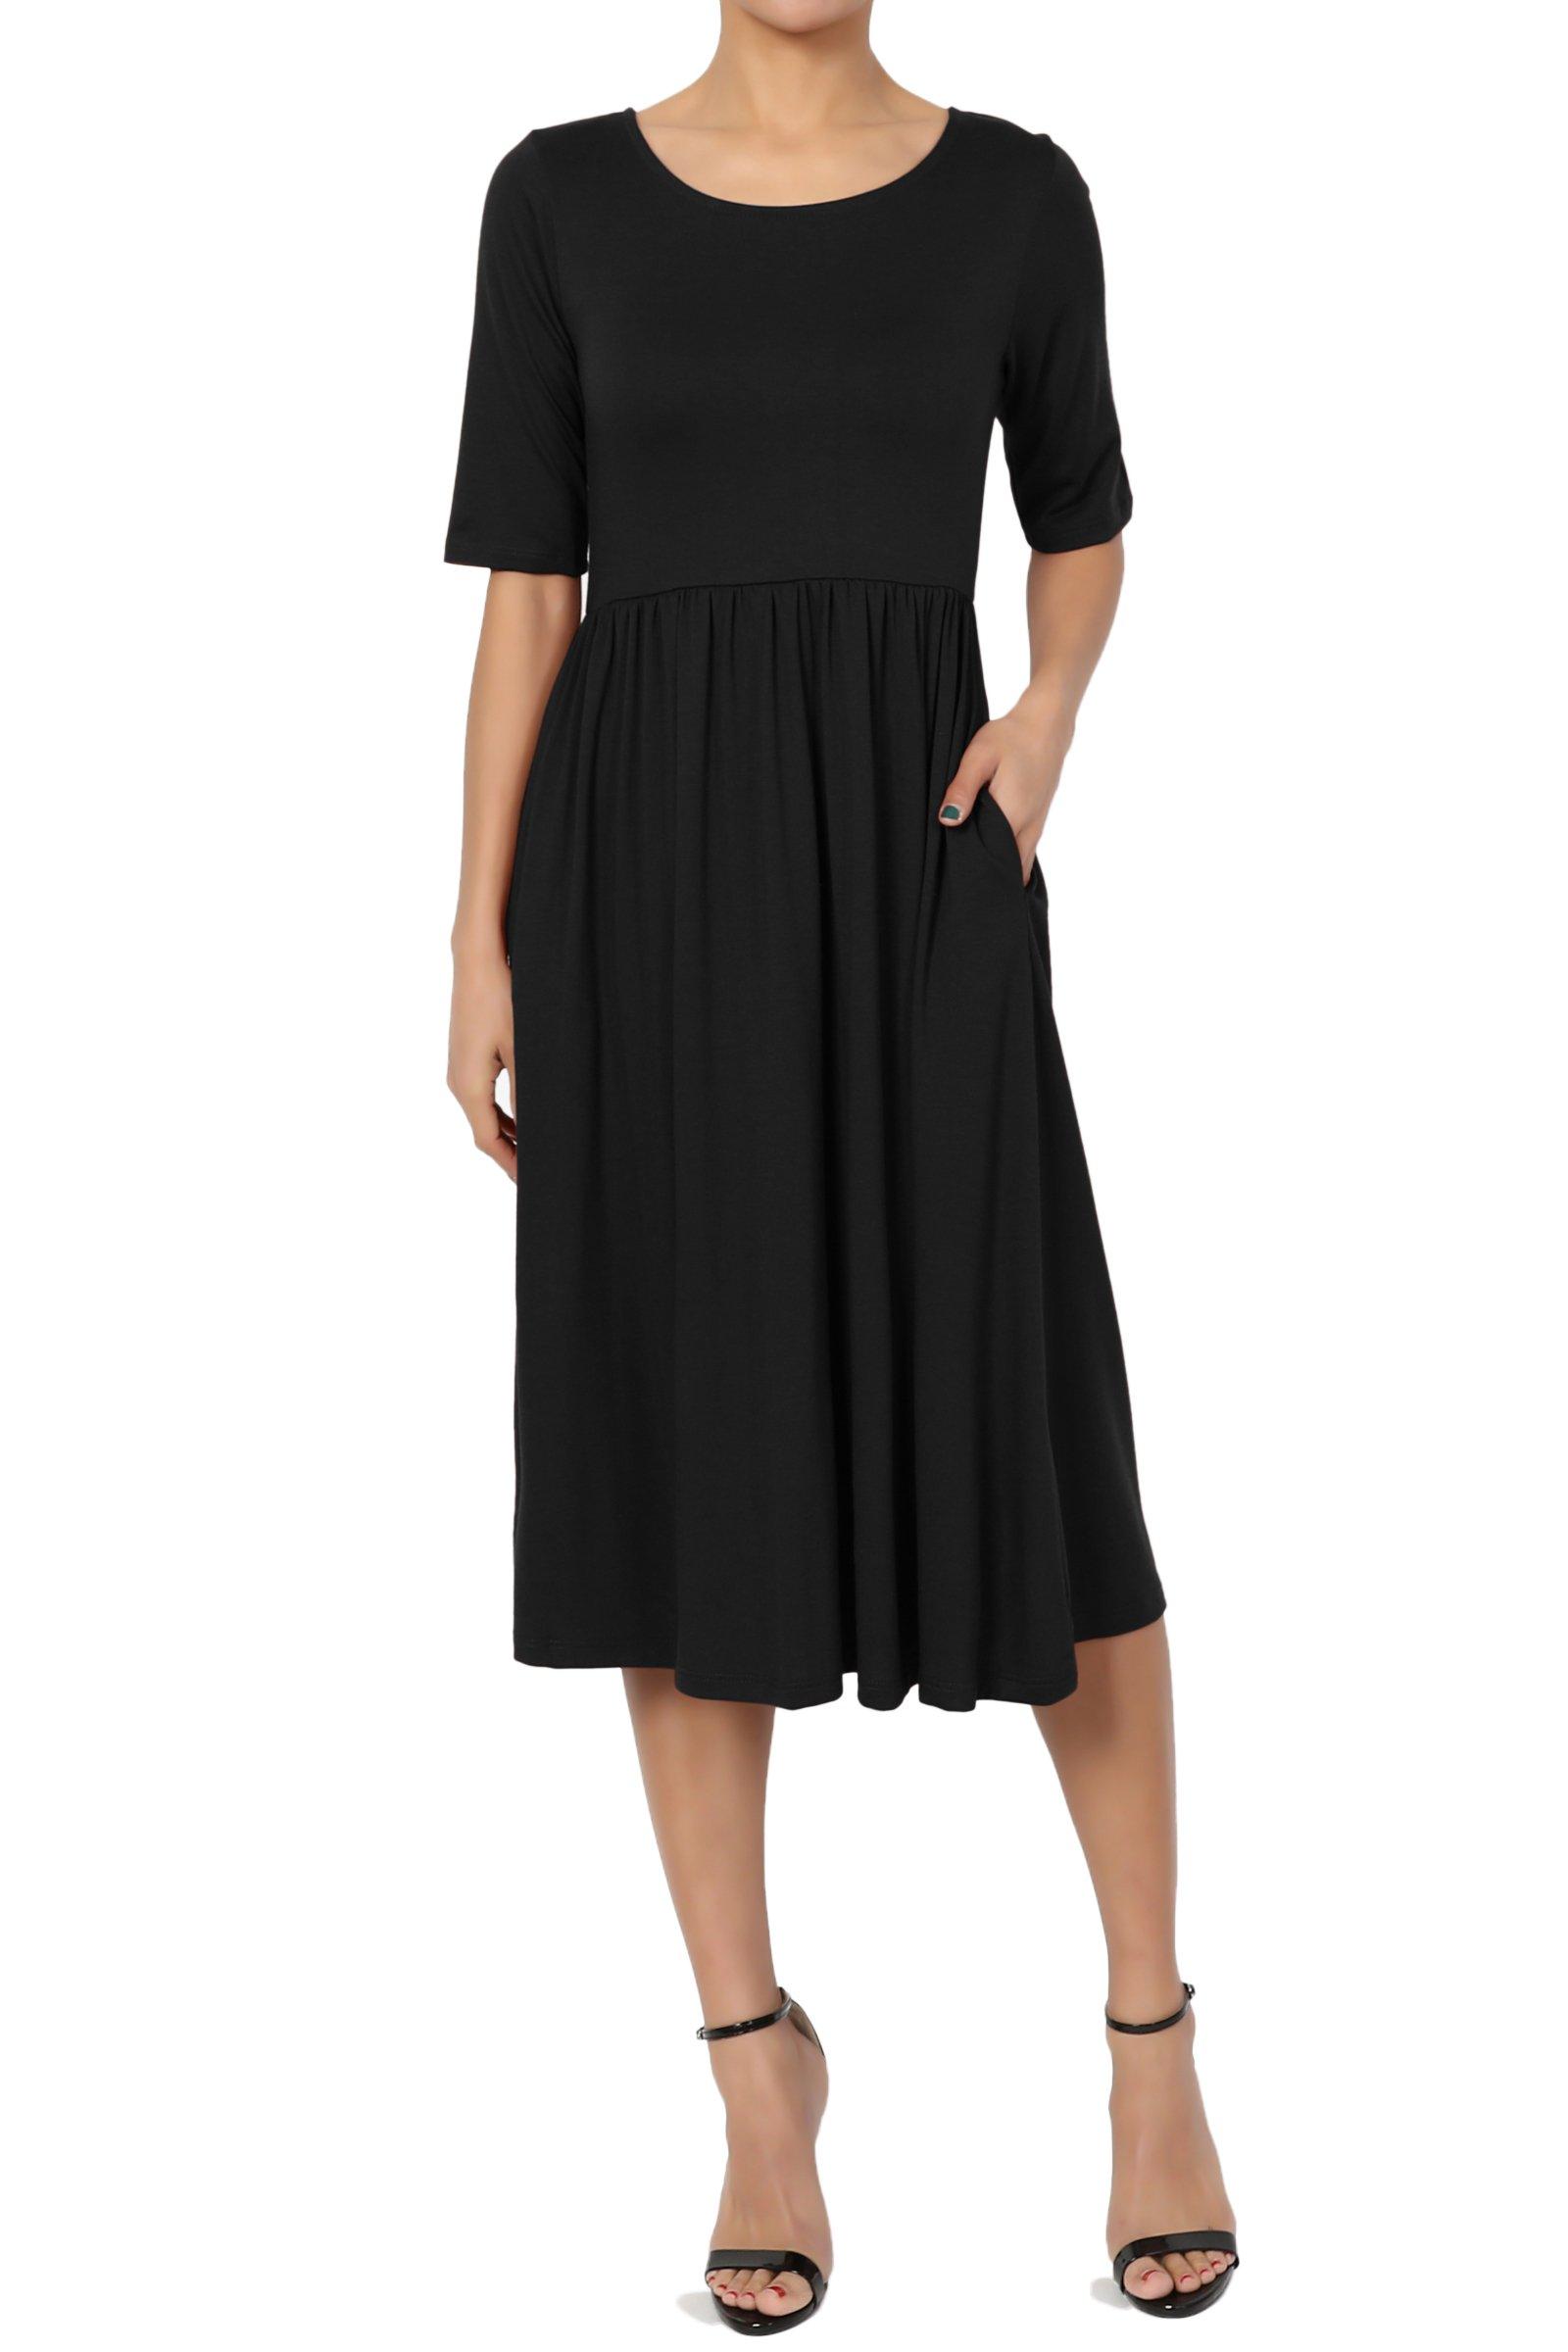 TheMogan Women's Half Sleeve Empire Waist Fit & Flare Pocket Dress Black 3XL